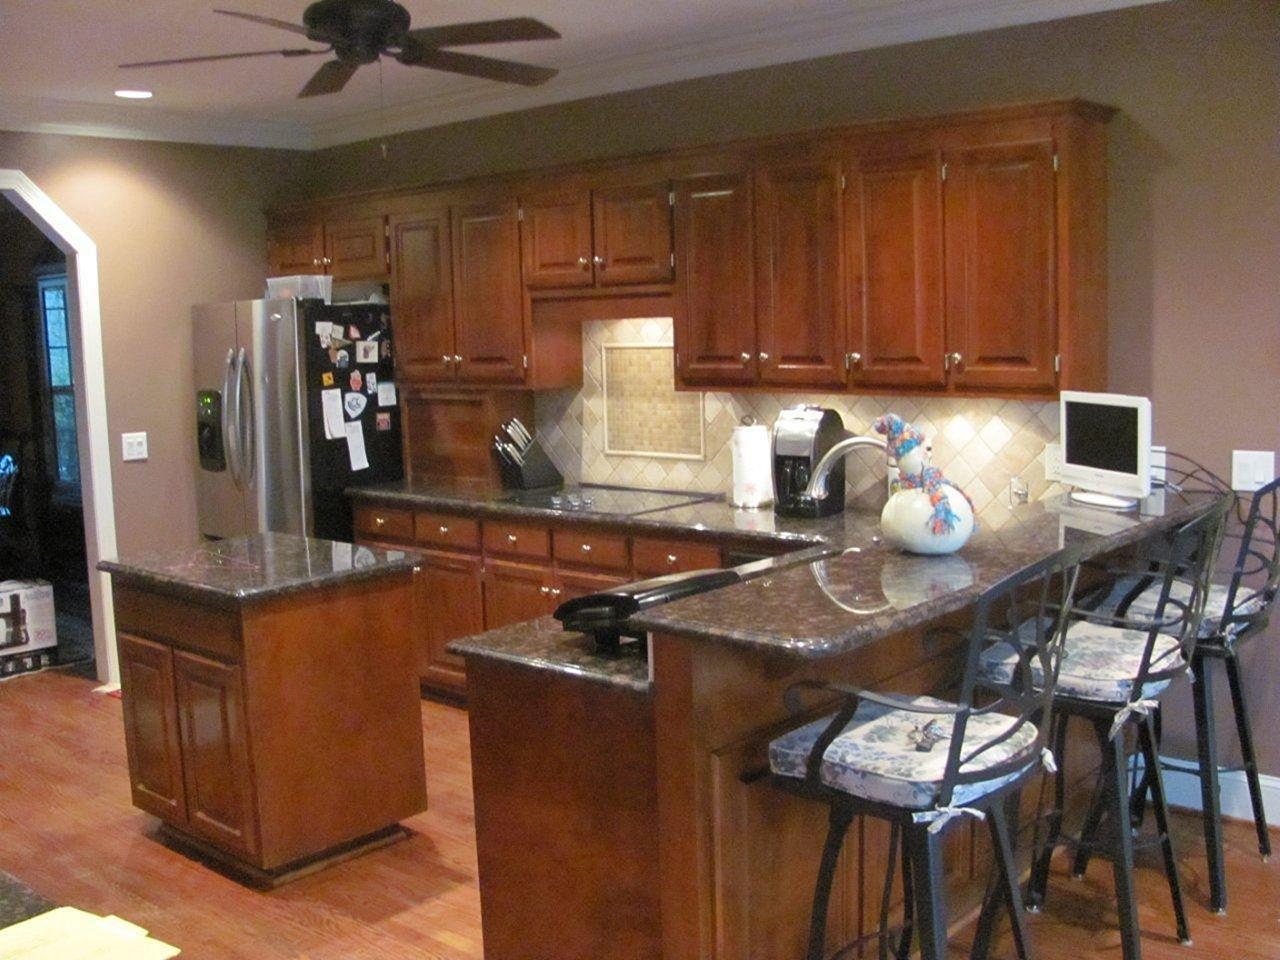 60 Awesome Kitchen Countertop Bar Designs Ideas For Your Elegant Kitchen Freshouz Com Kitchen Bar Design Kitchen Remodel Kitchen Design